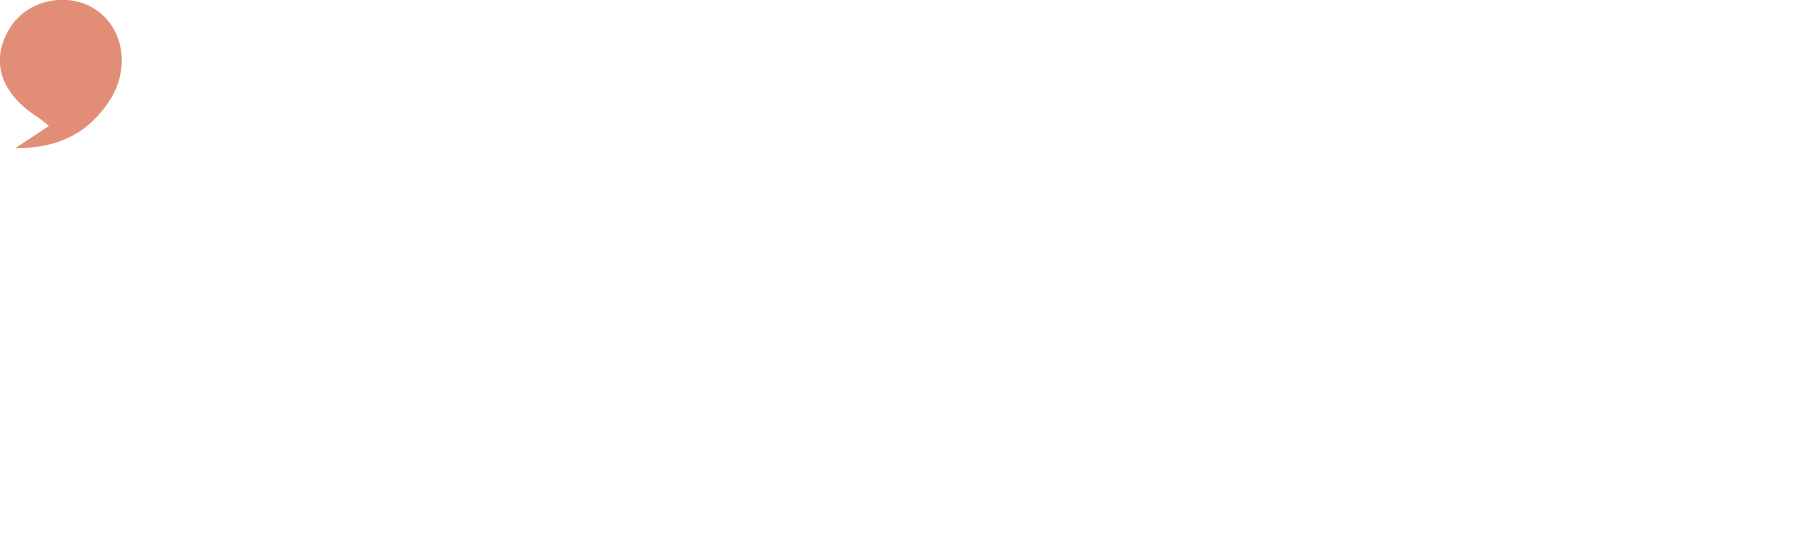 Imagis Logo White